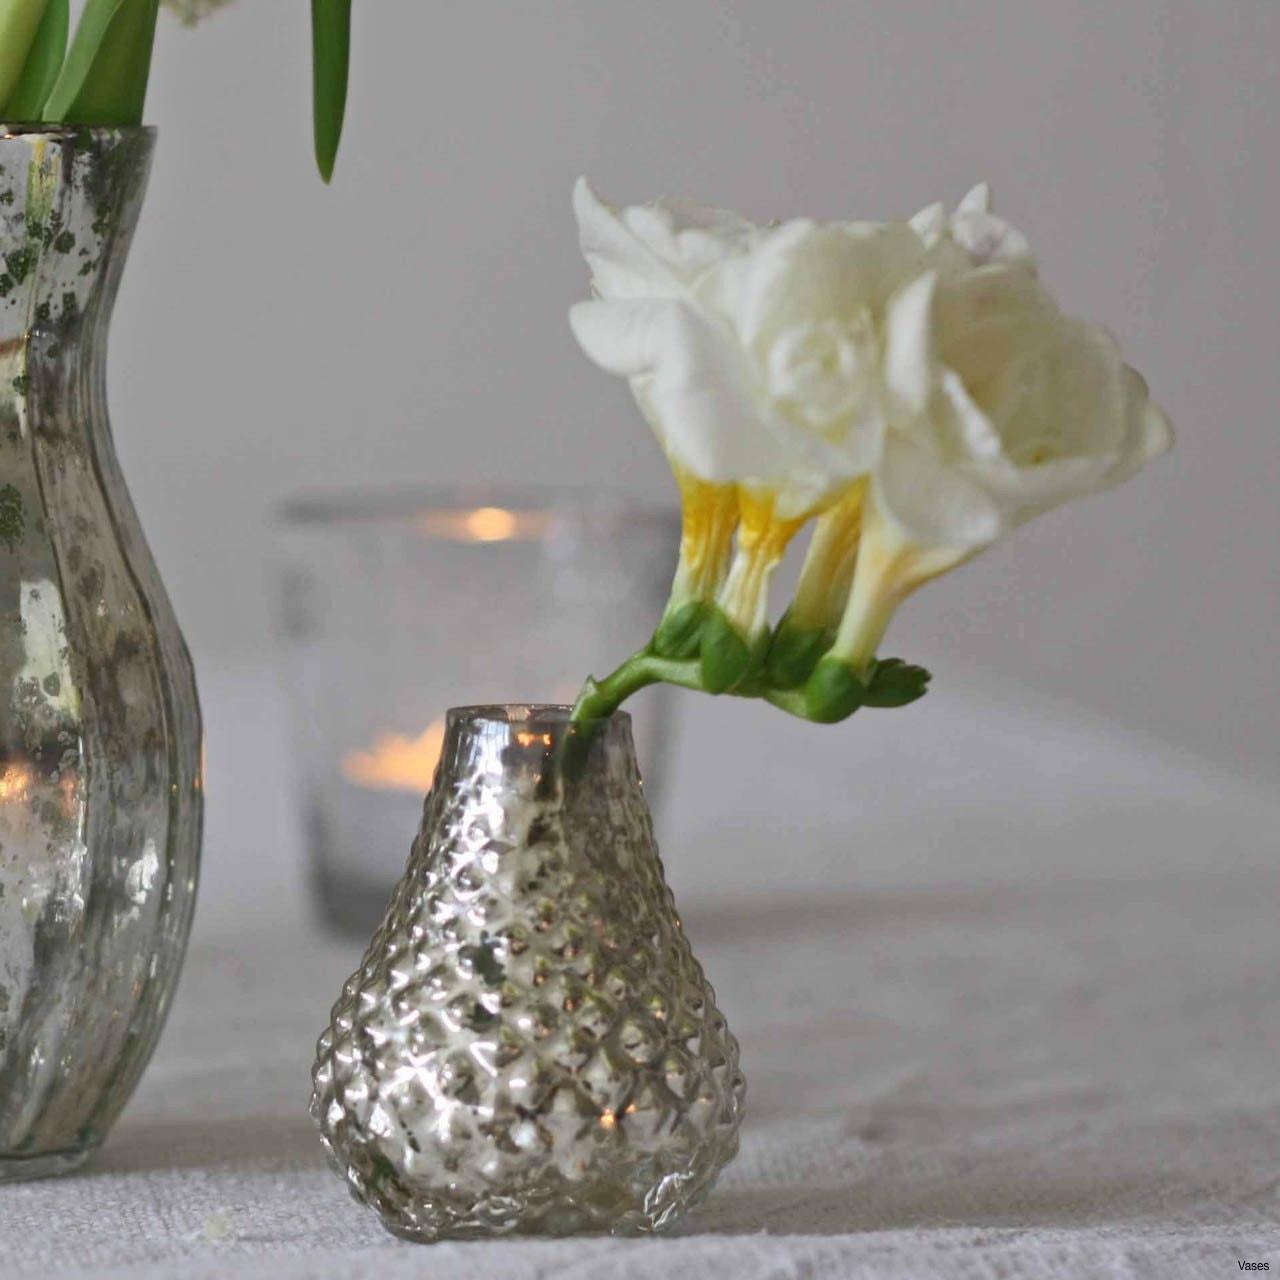 diy vases for weddings of diy centerpiece ideas luxury jar flower 1h vases bud wedding vase within diy centerpiece ideas luxury jar flower 1h vases bud wedding vase centerpiece idea i 0d design